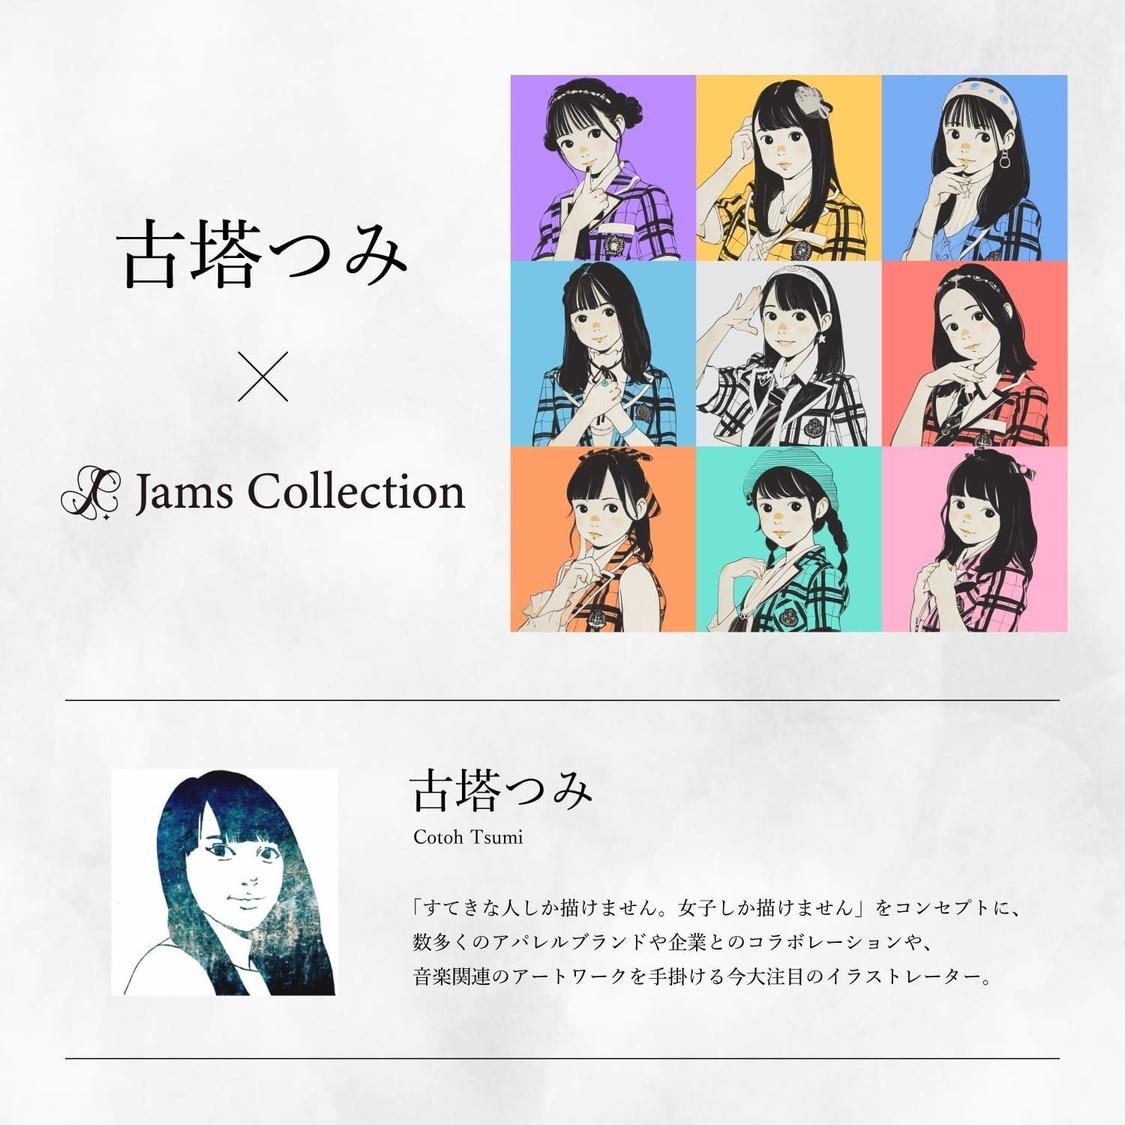 JamsCollection、人気イラストレーター・古塔つみ描き下ろしコラボグッズ販売決定!